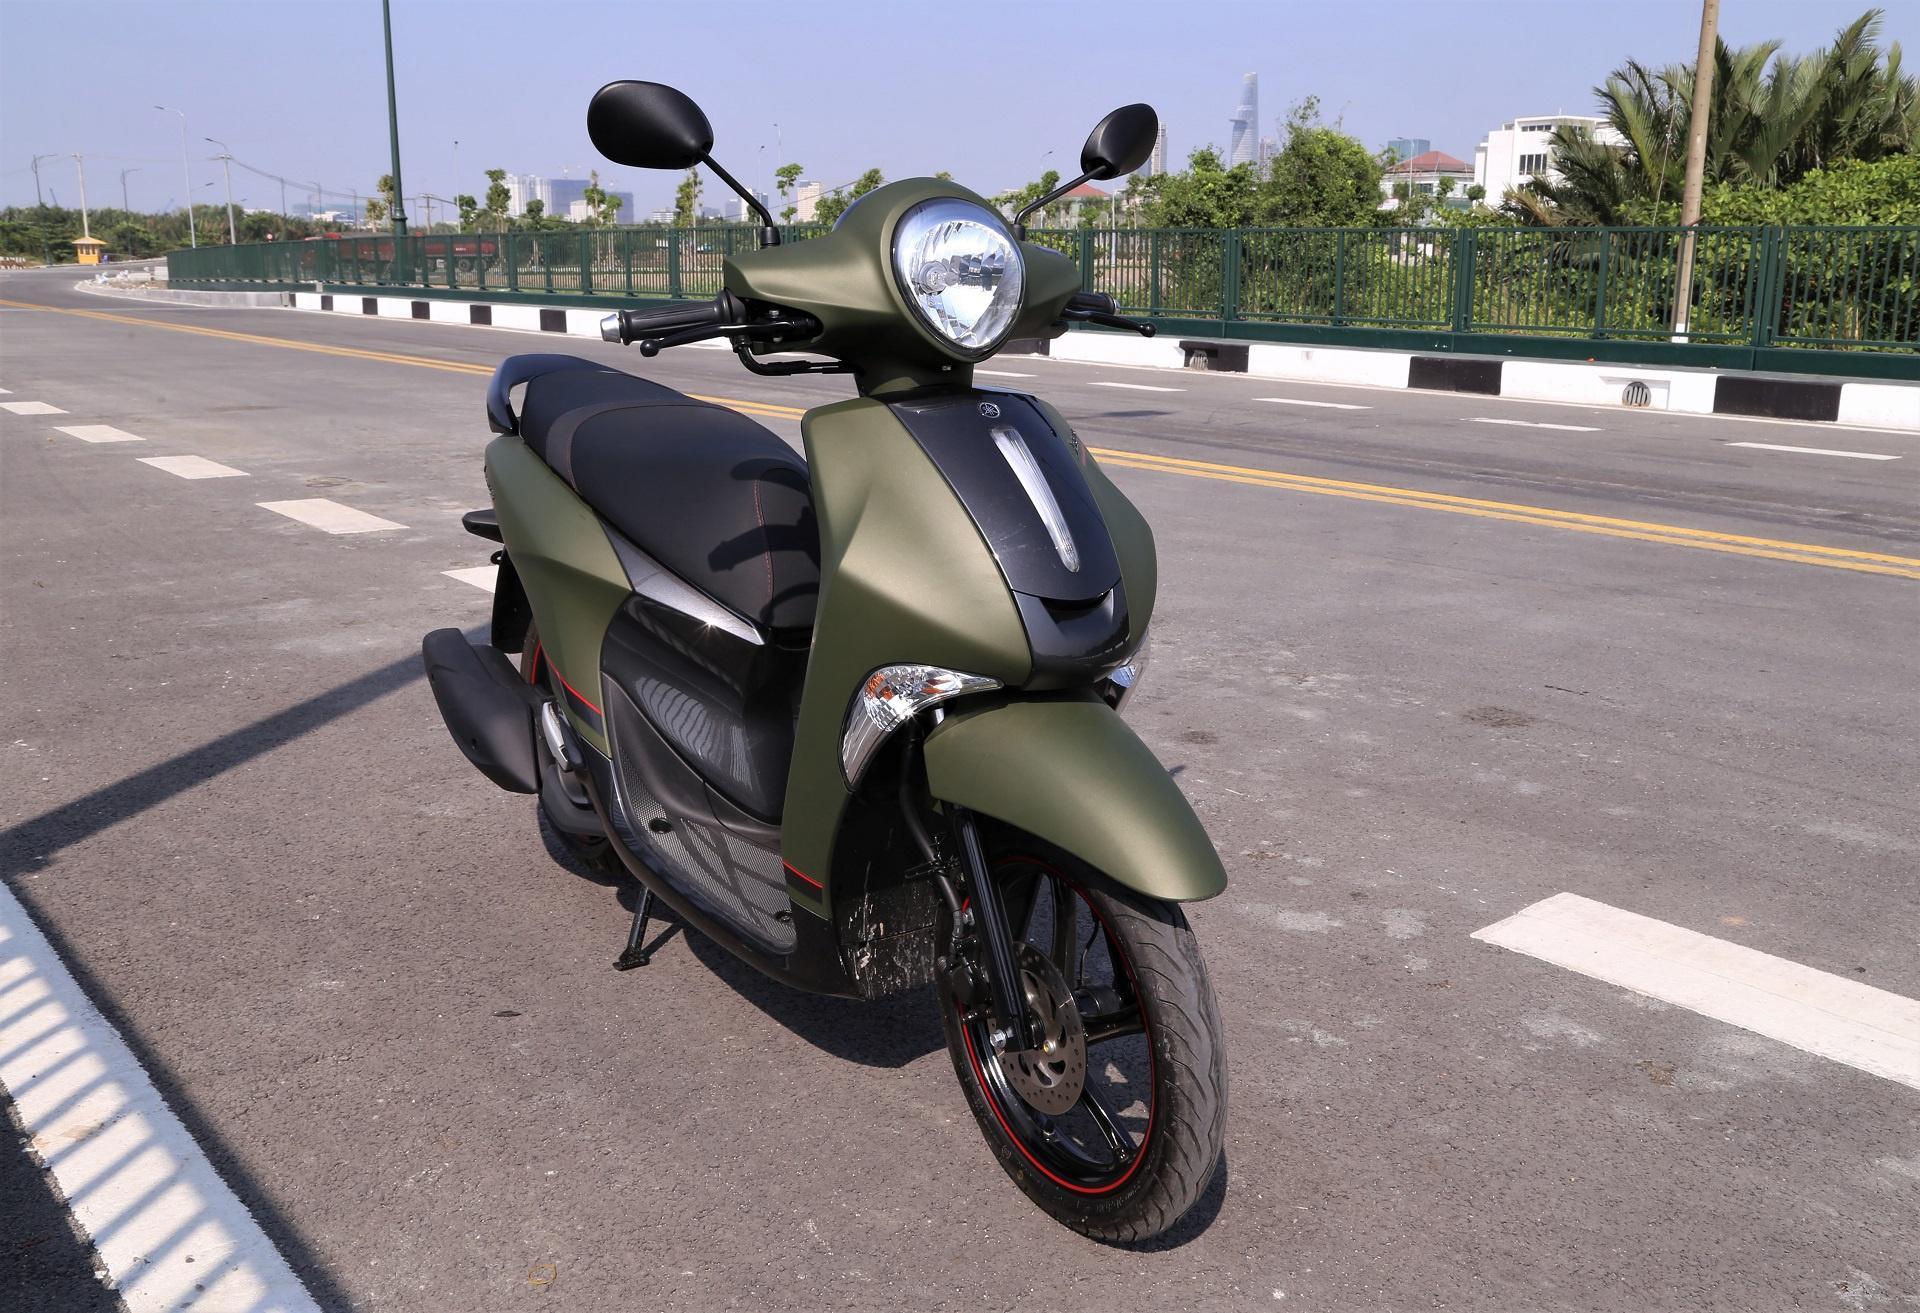 So sanh Honda Scoopy 2021 va Yamaha Janus anh 4